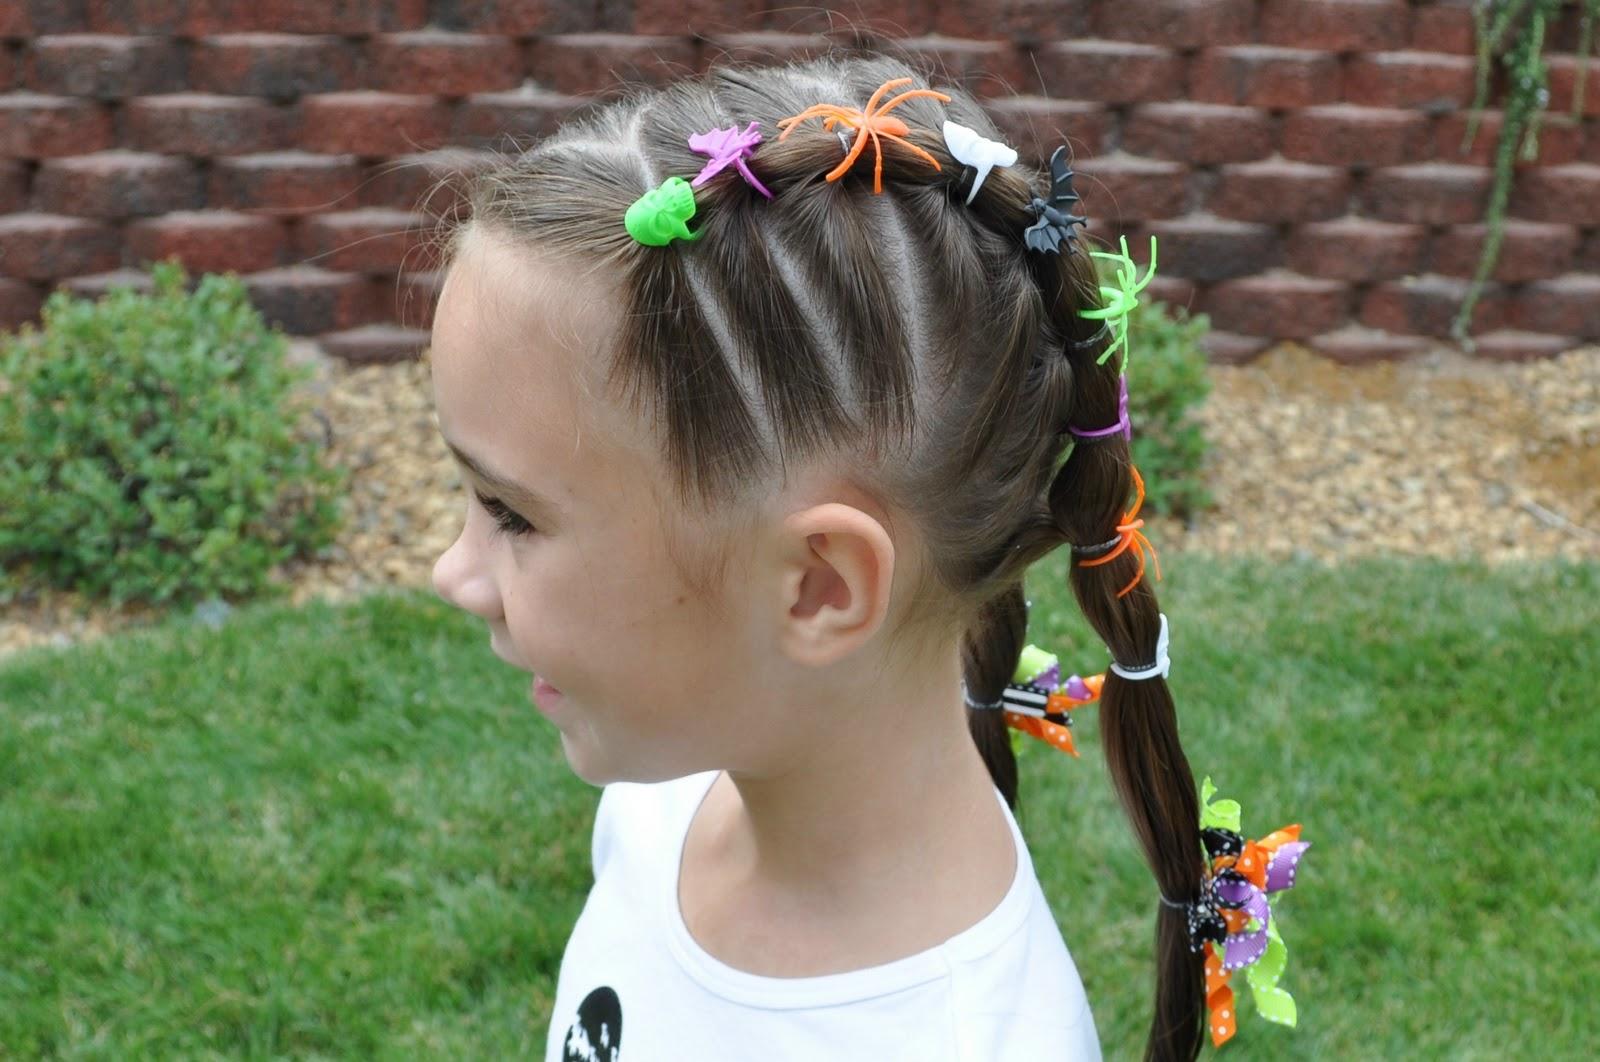 Peinados para Halloween fotos de looks (Foto) Ella Hoy - Peinados De Halloween Fotos